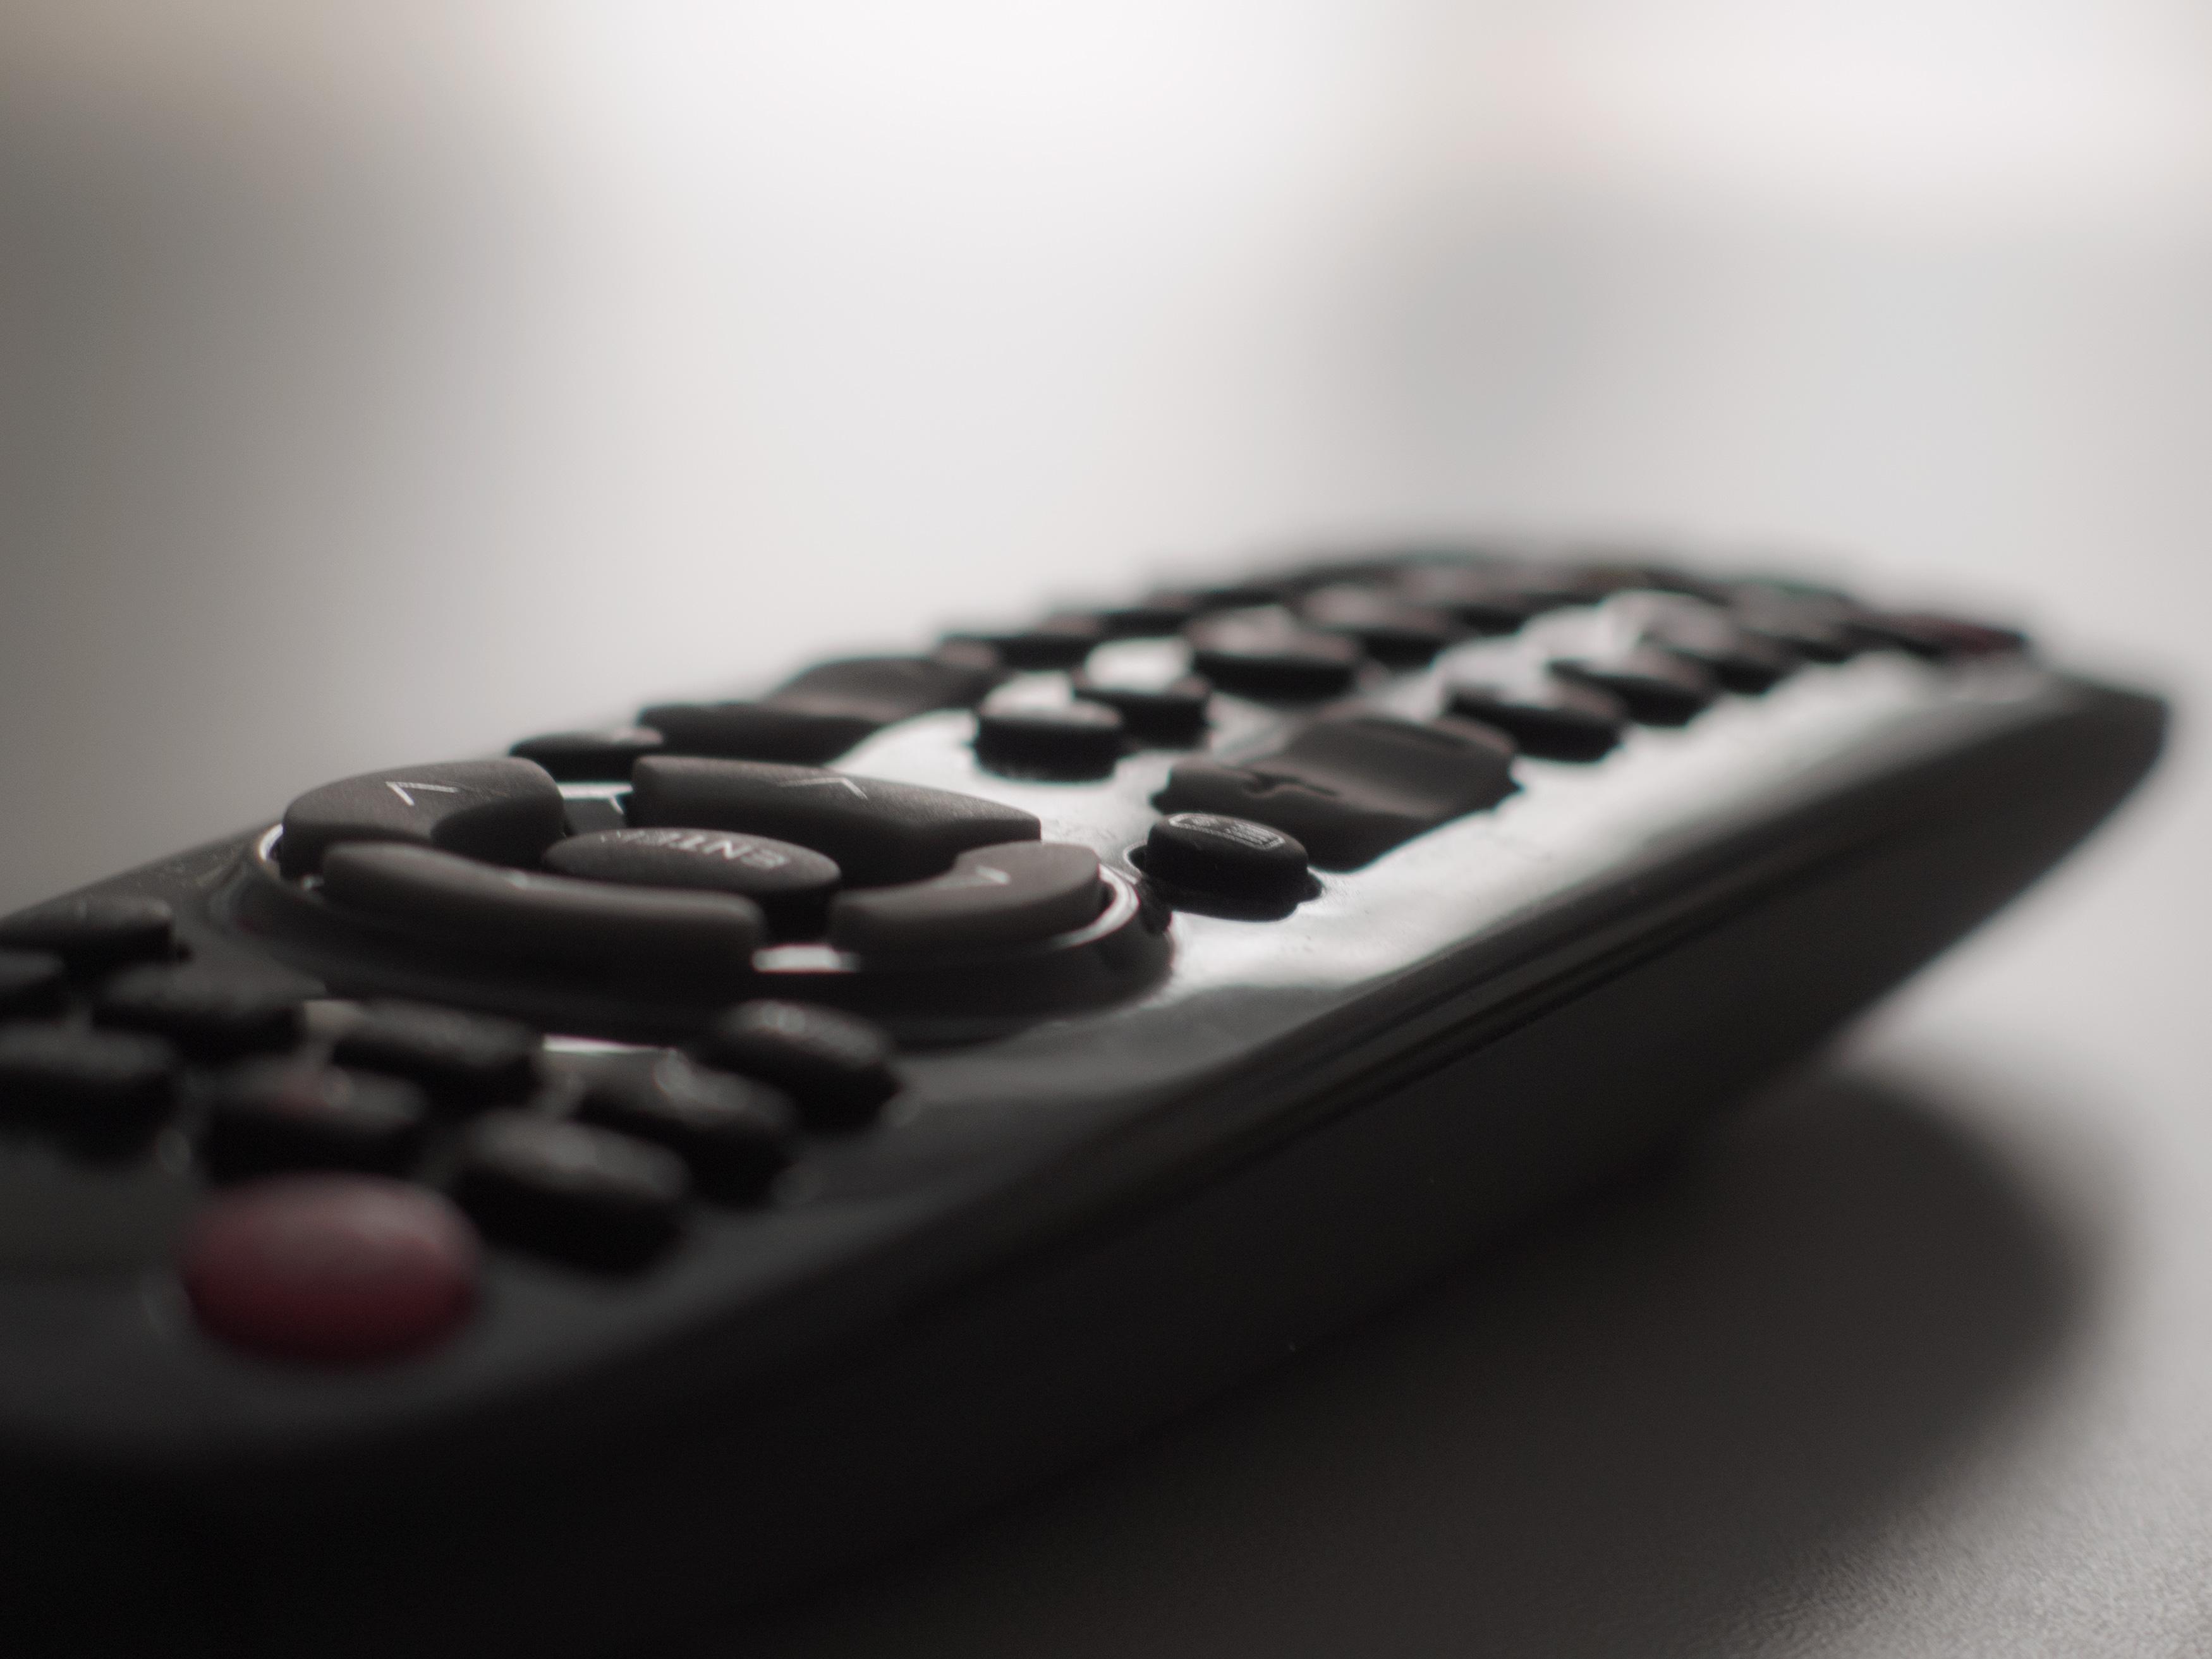 FREE IMAGE: TV Remote Control Close Up - Libreshot Public ...